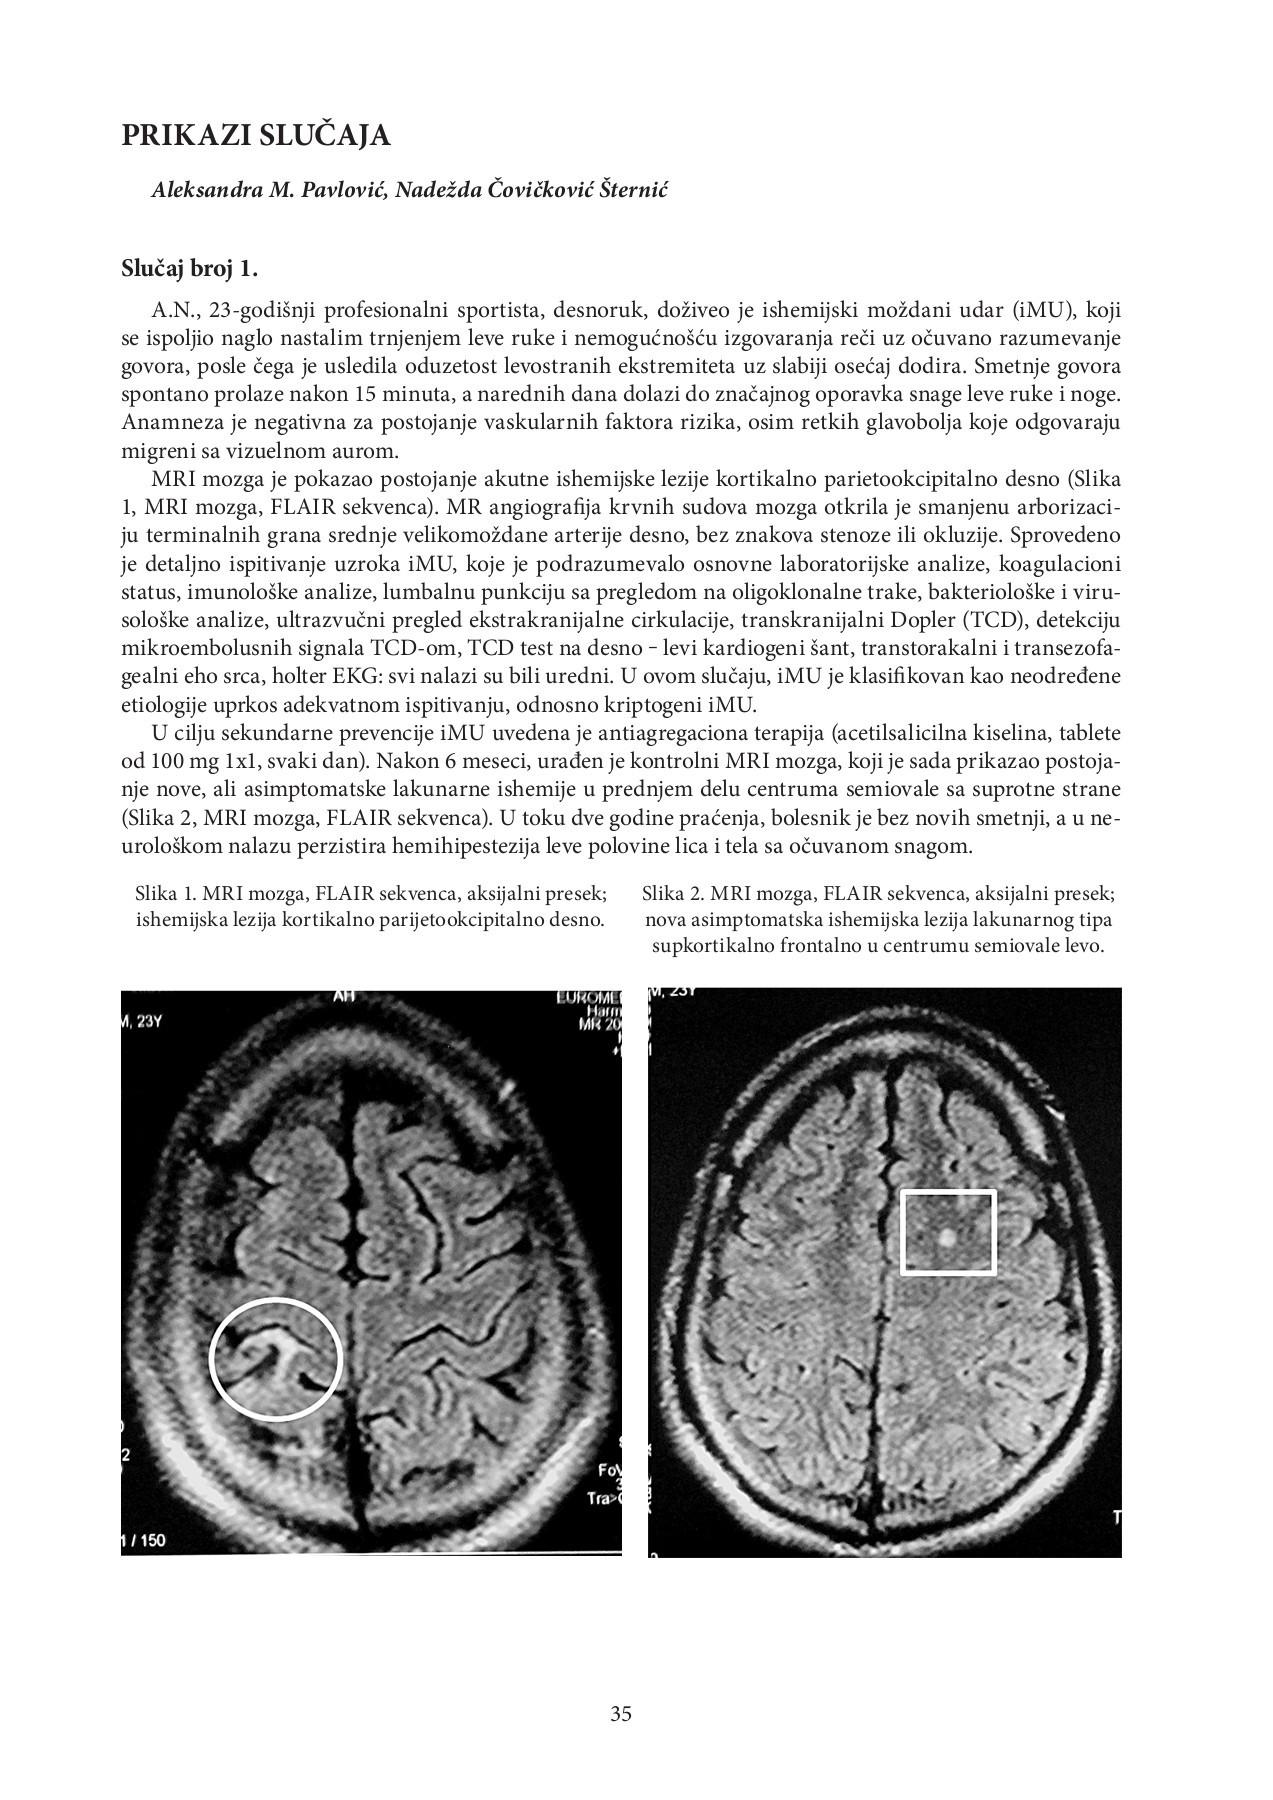 hipertenzija mri mozga)